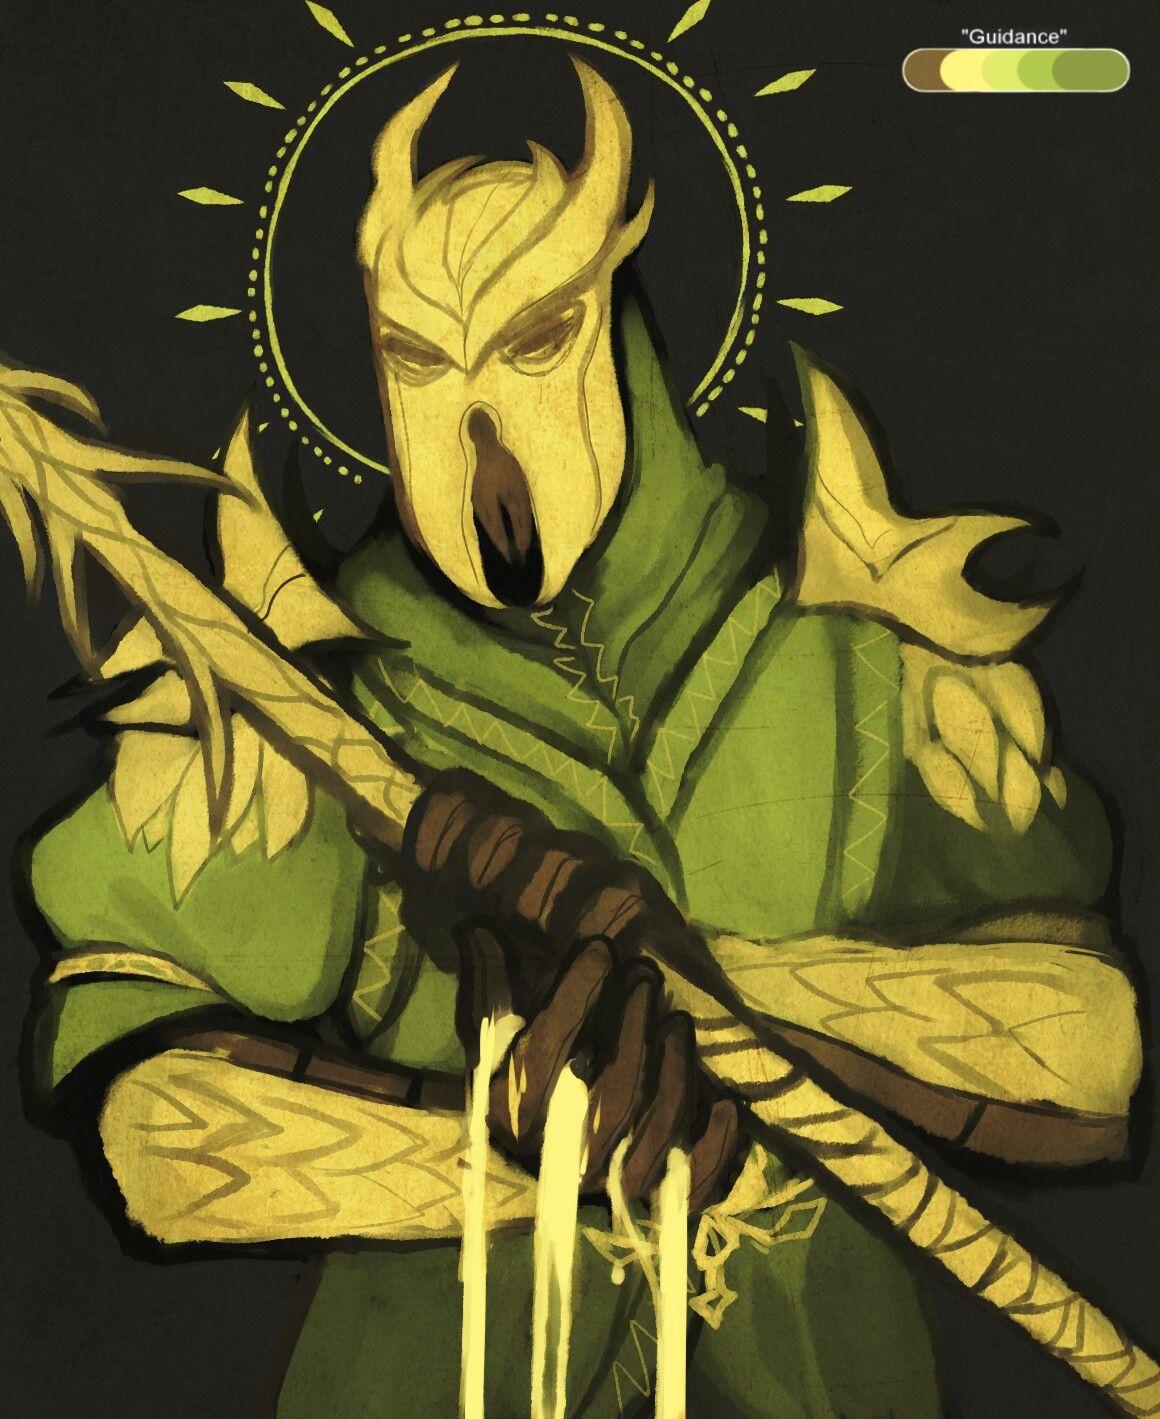 Fanart Miraak Elder Scrolls Art Skyrim Fanart Skyrim Art